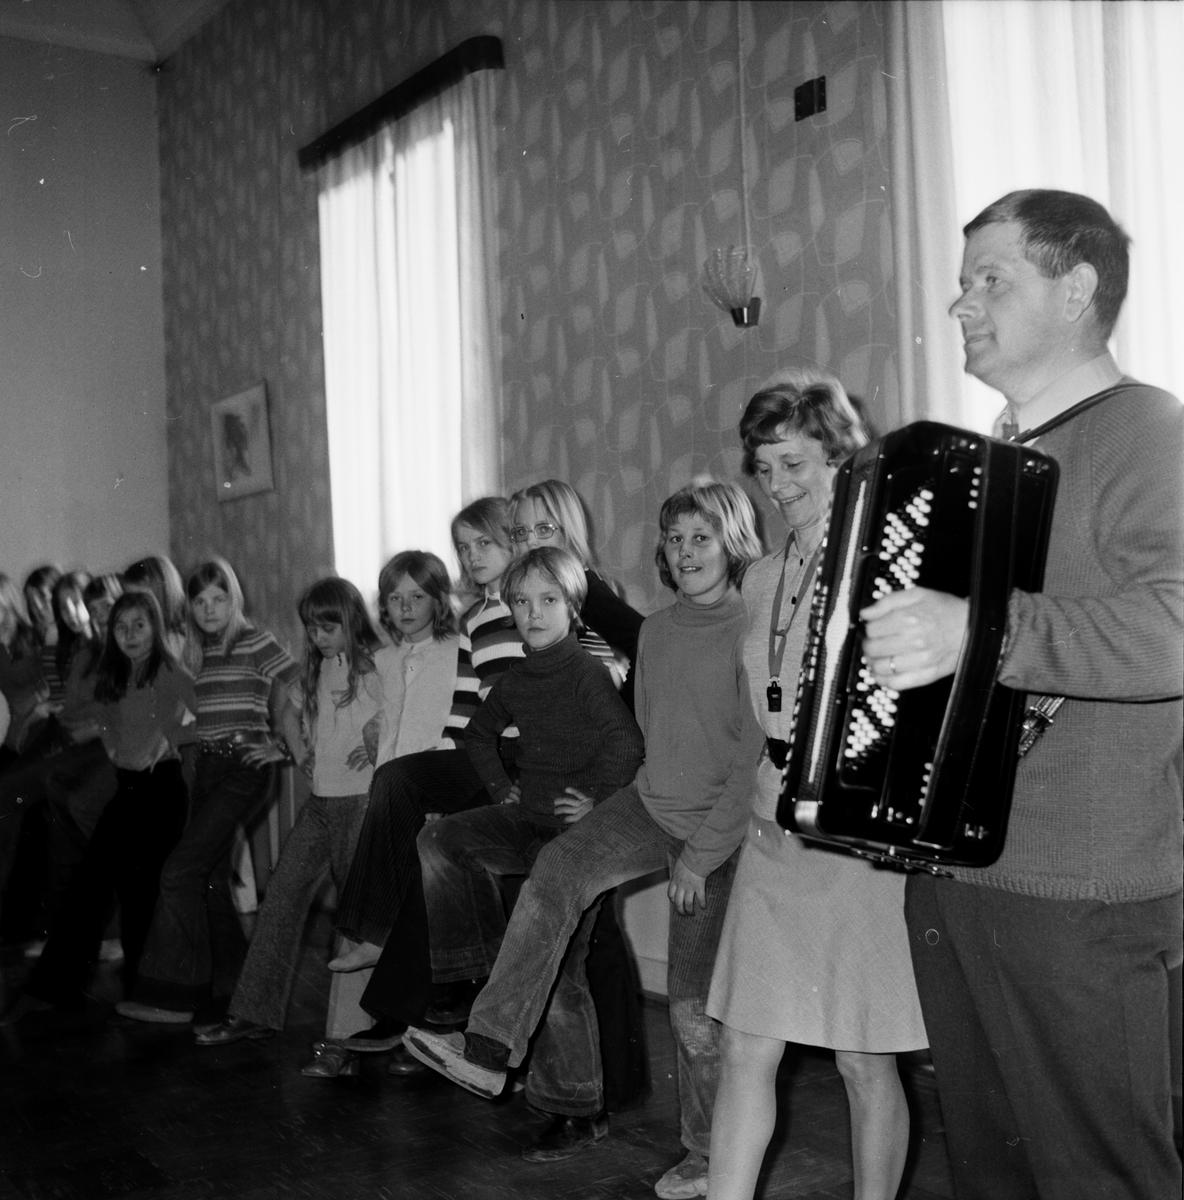 Godtemplarlokal, Juniordans, April 1972